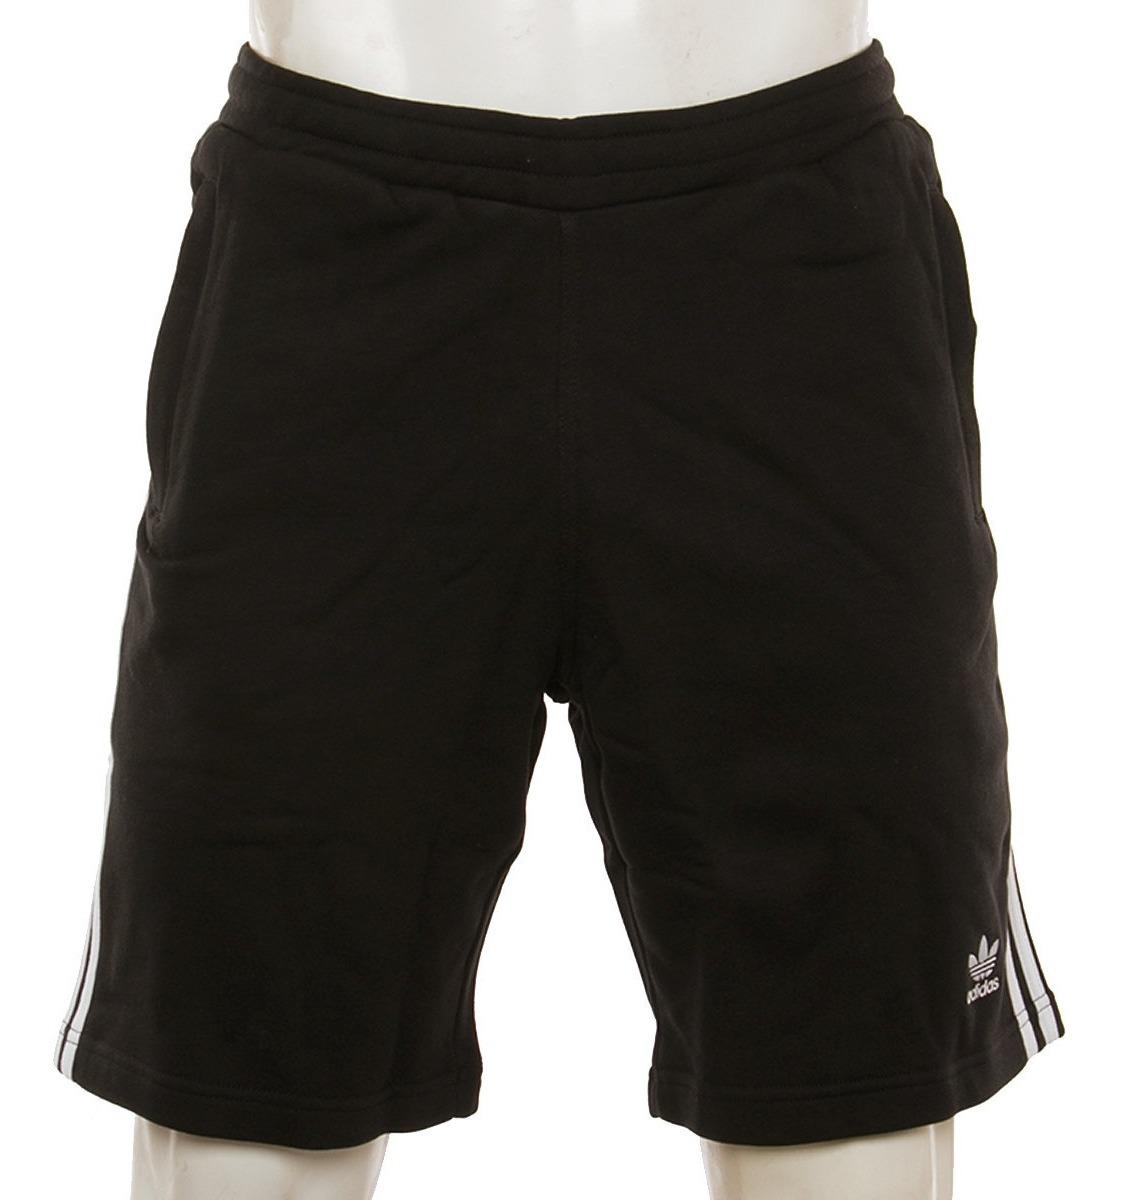 Shorts 3 Tiras Negro adidas Originals Tienda Oficial